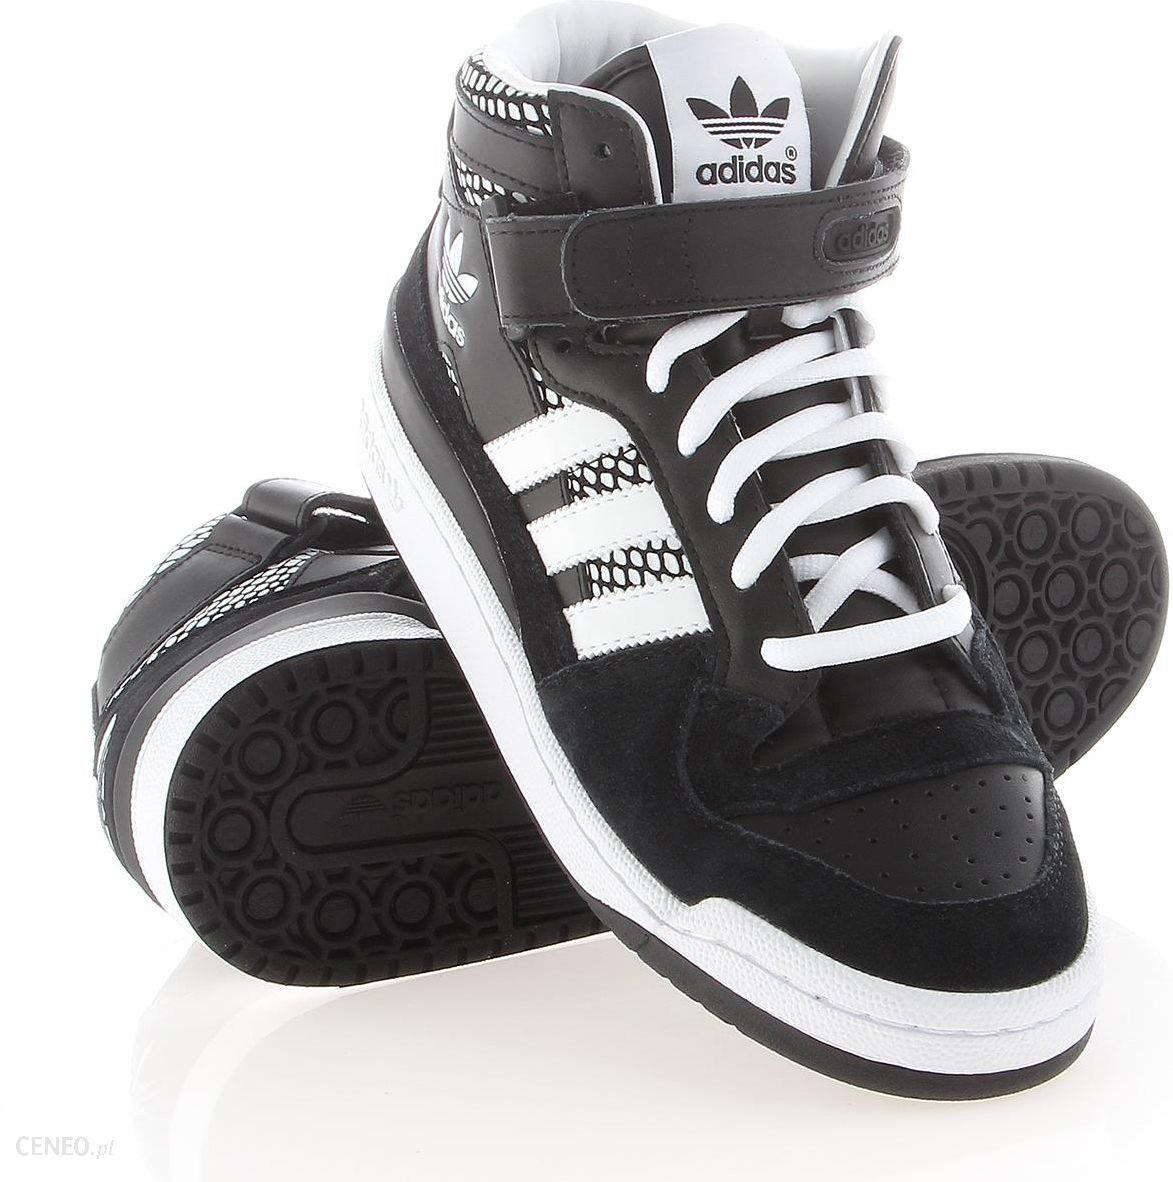 pretty nice 1cb1d 501f8 Adidas Forum Mid RS B35272 - zdjęcie 1